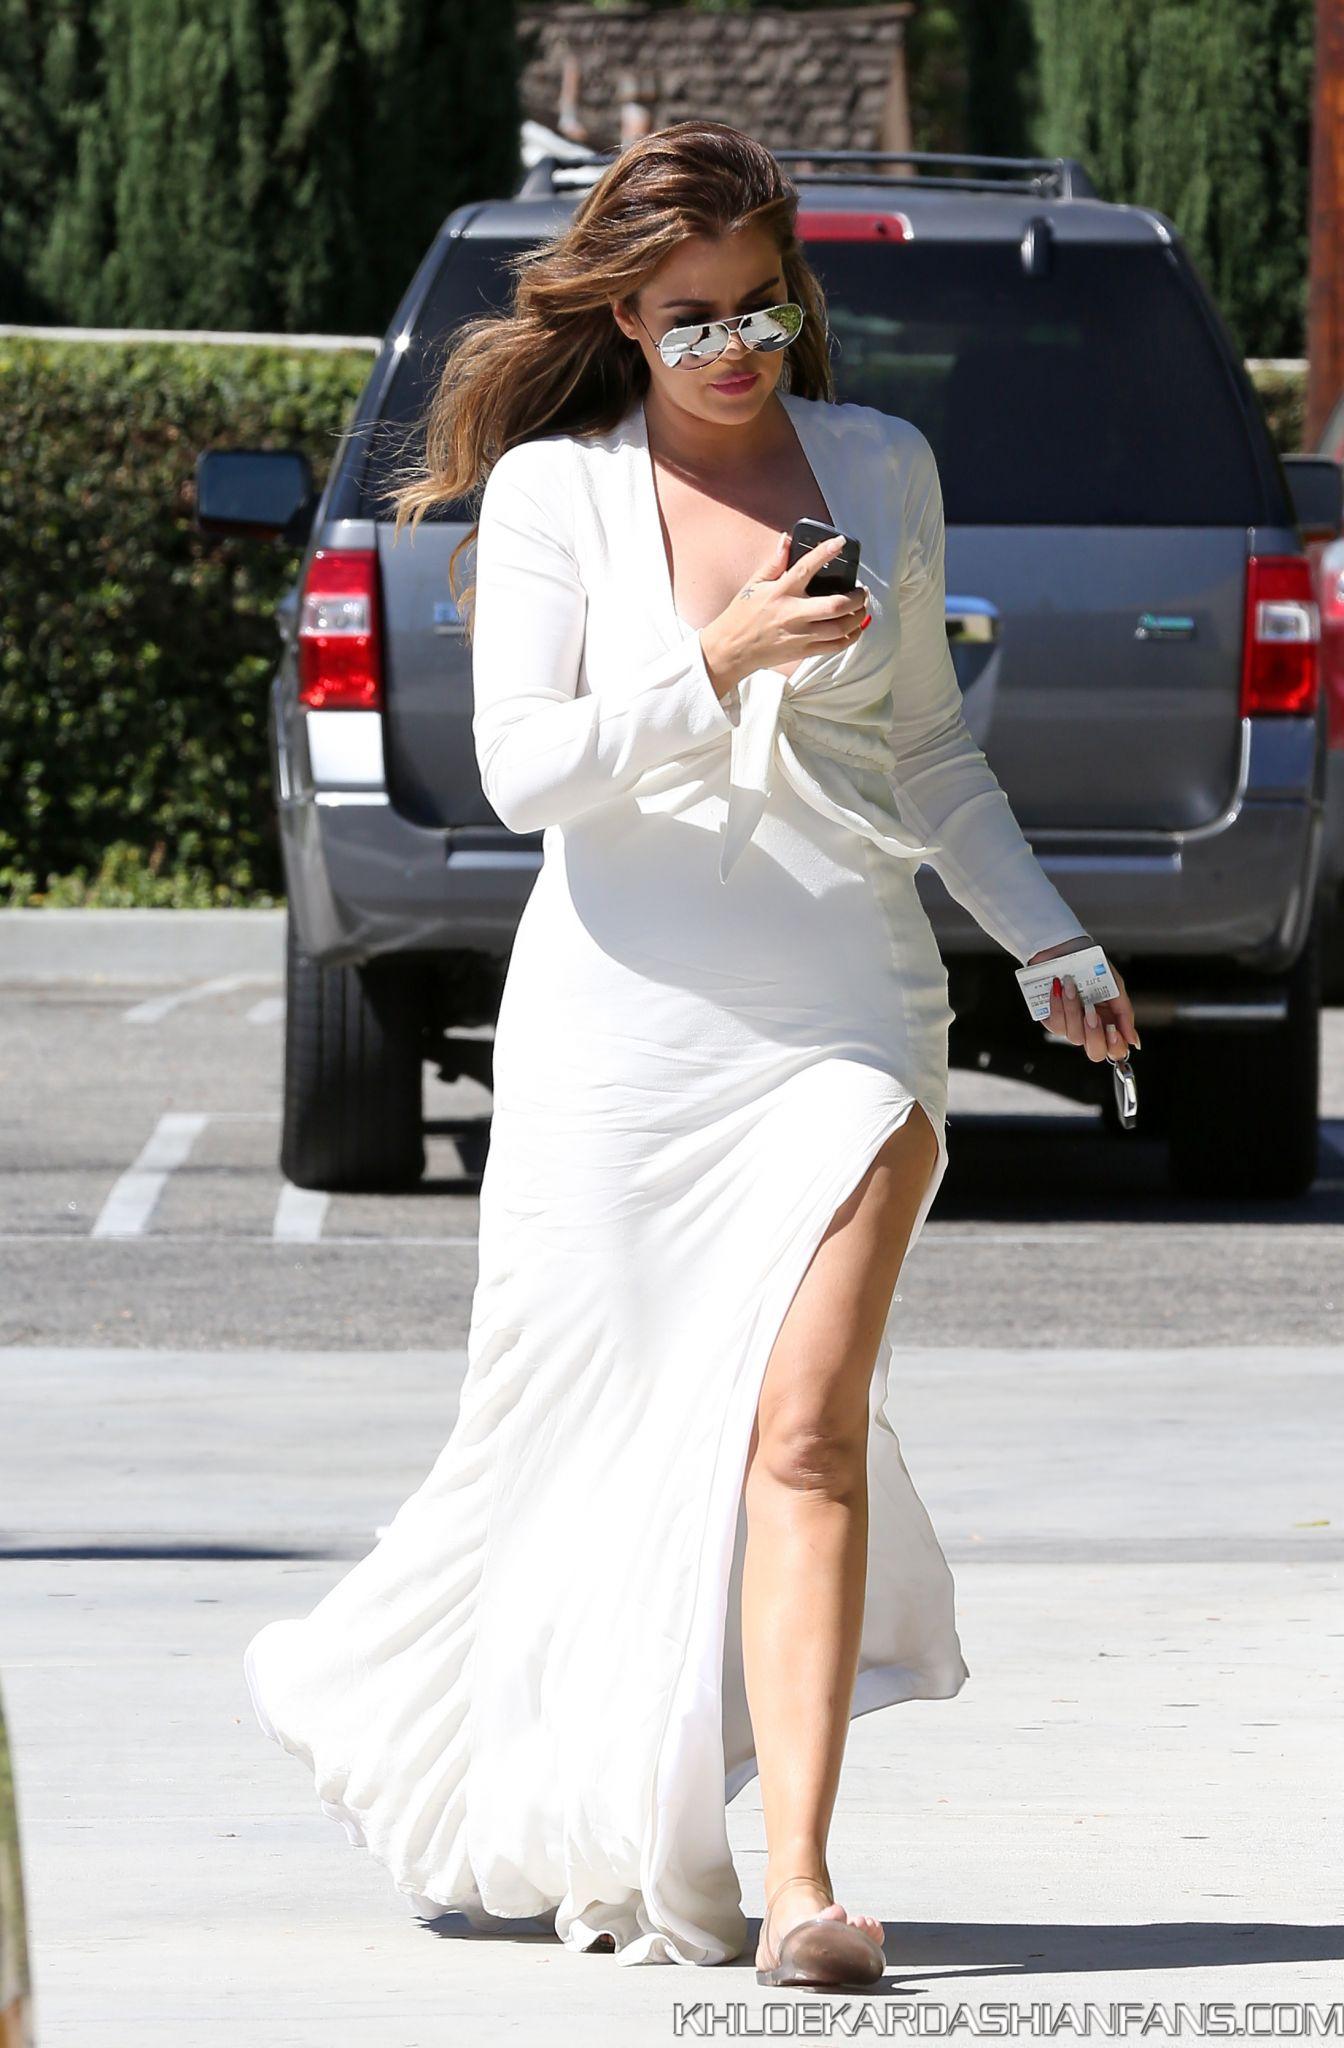 Khloe Kardashian 2014 : Khloe Kardashian in White Dress -20